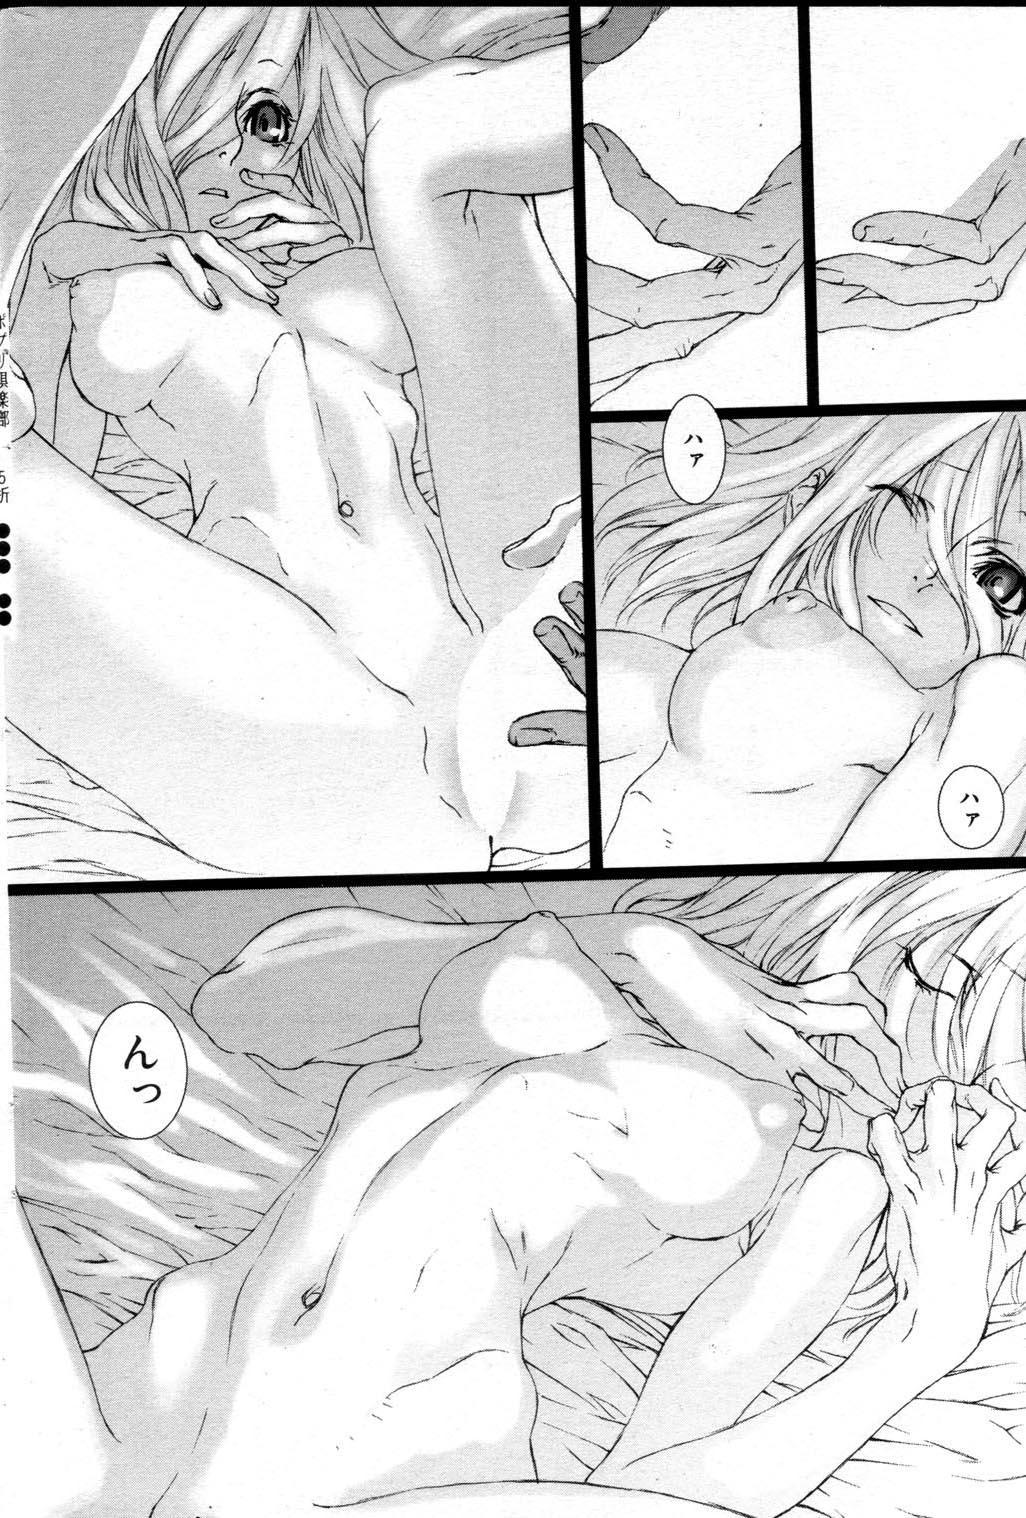 [Saiki Keita] FAIRY GONE GARDEN (Part Two) Kouhen 11